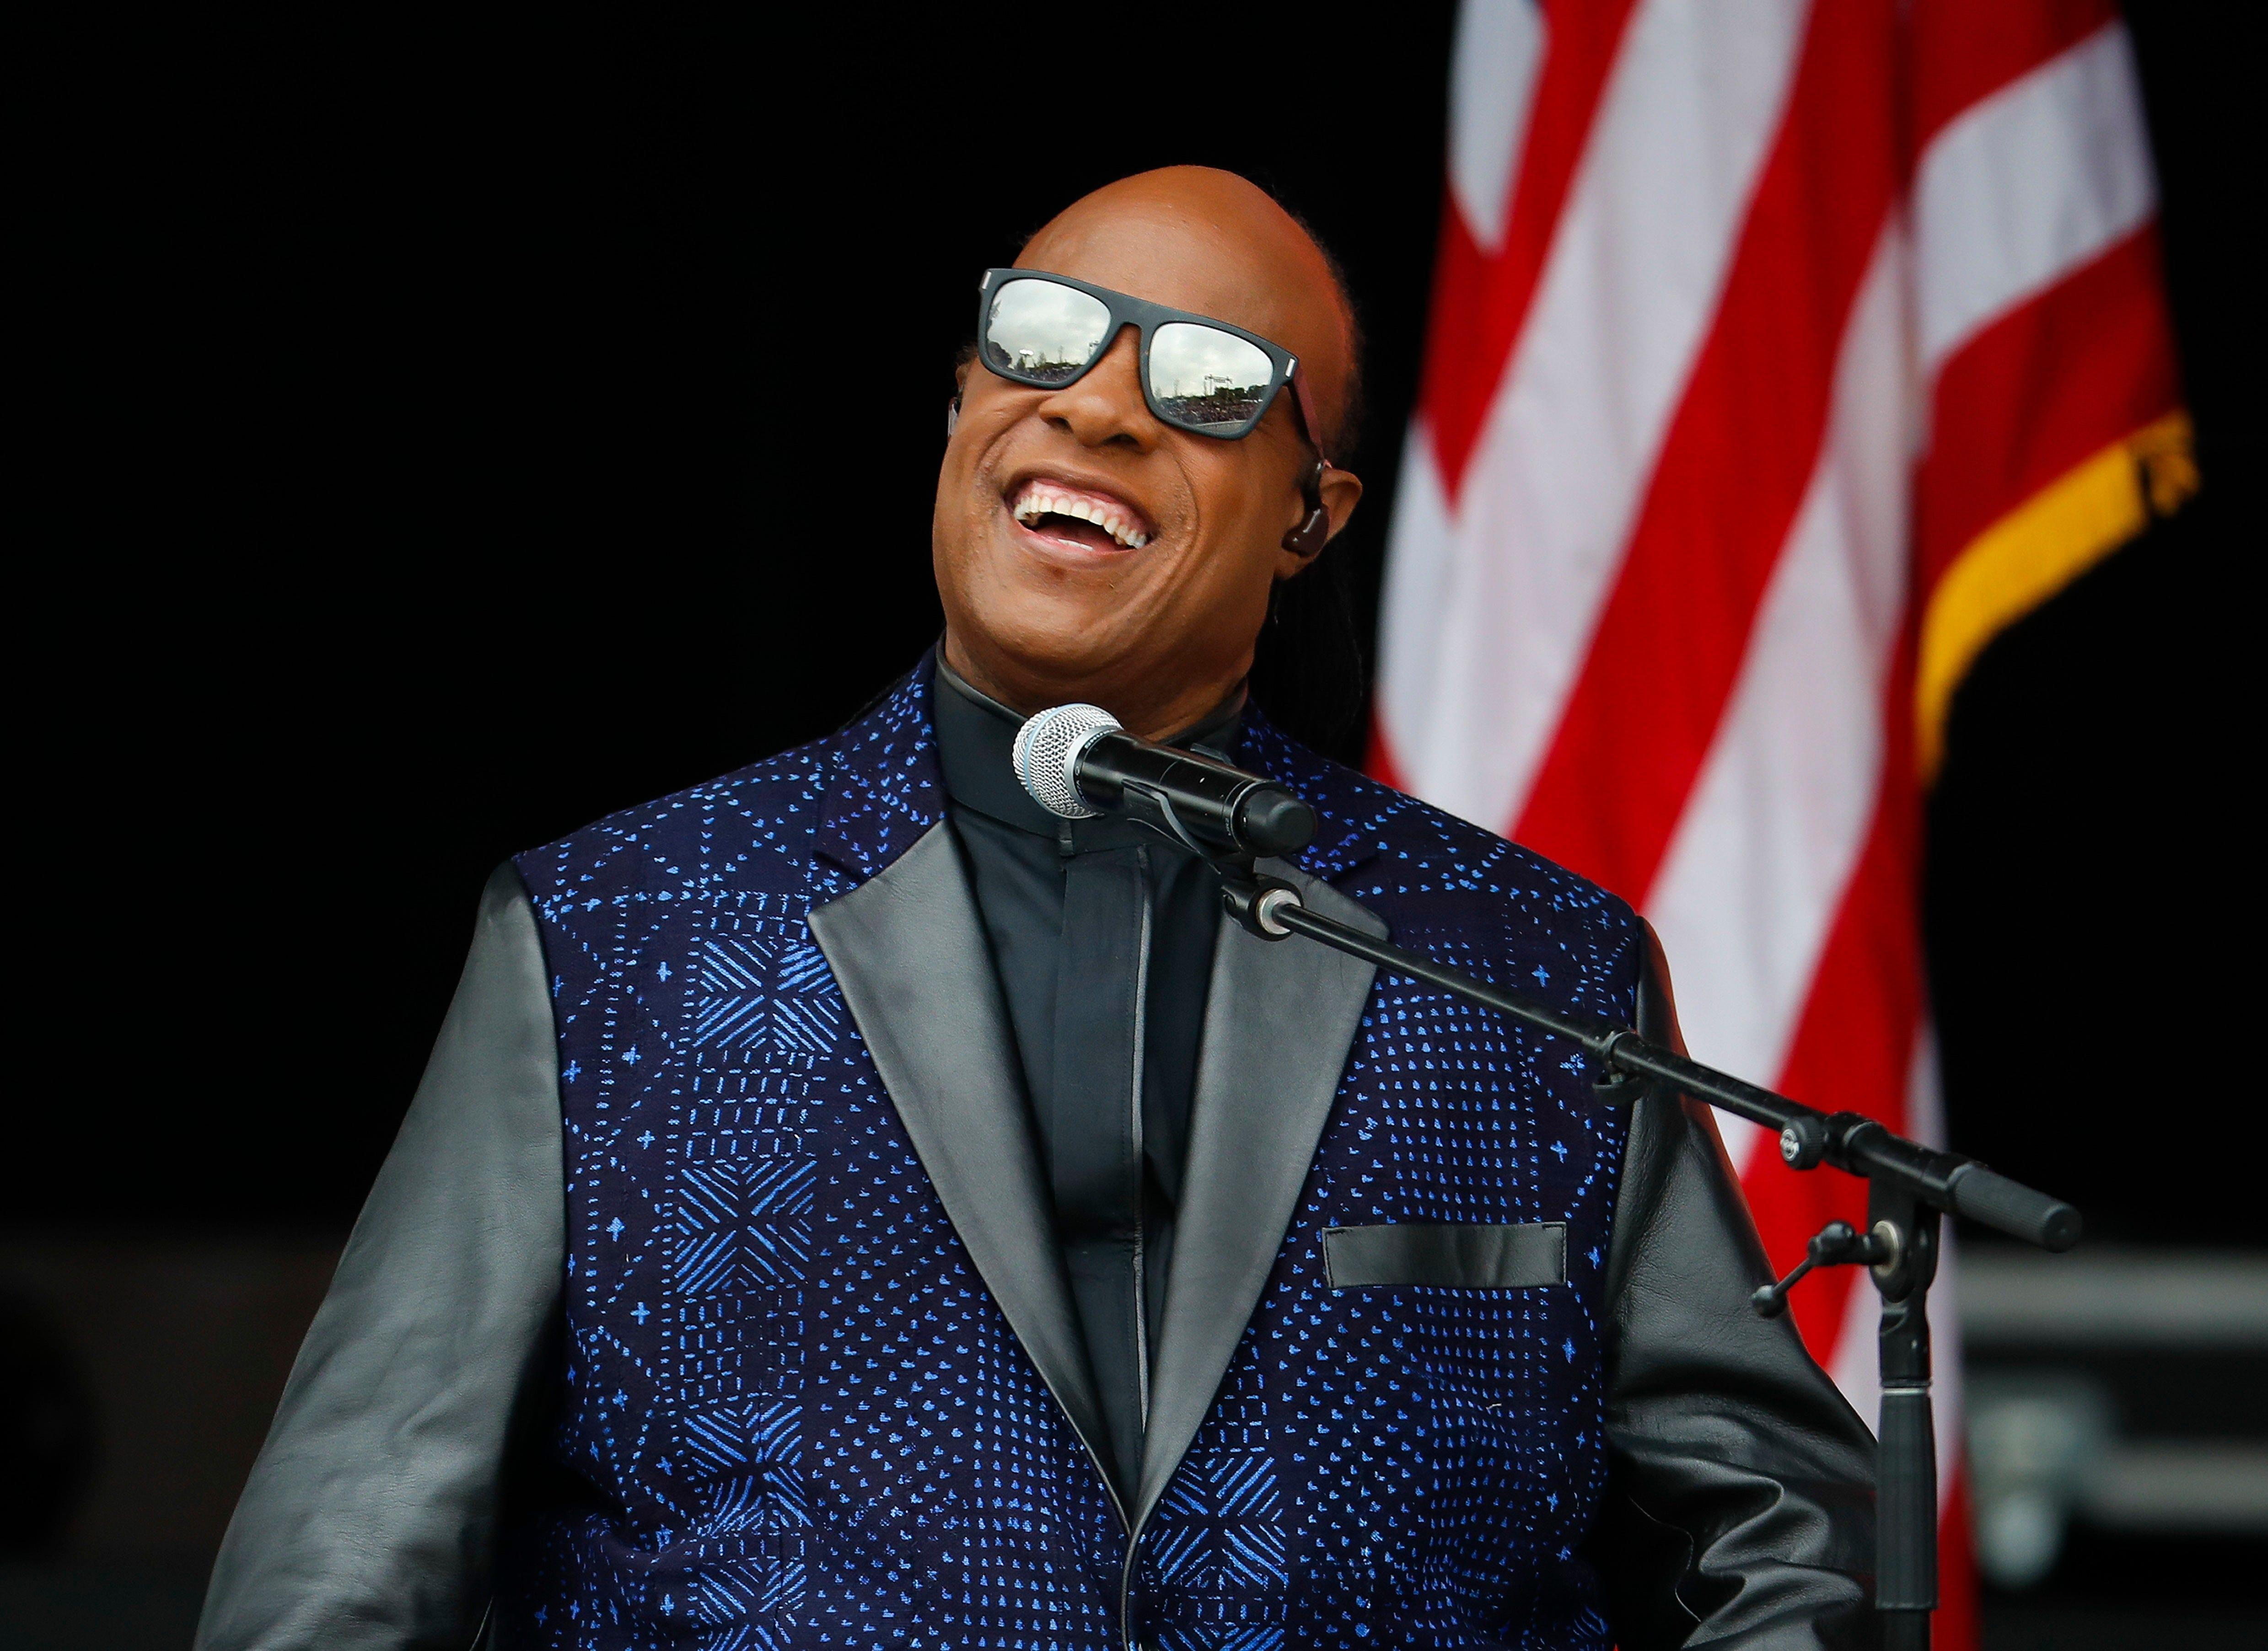 Stevie Wonder Tour 2020 Usa Stevie Wonder's kidney transplant may sideline him till 2020